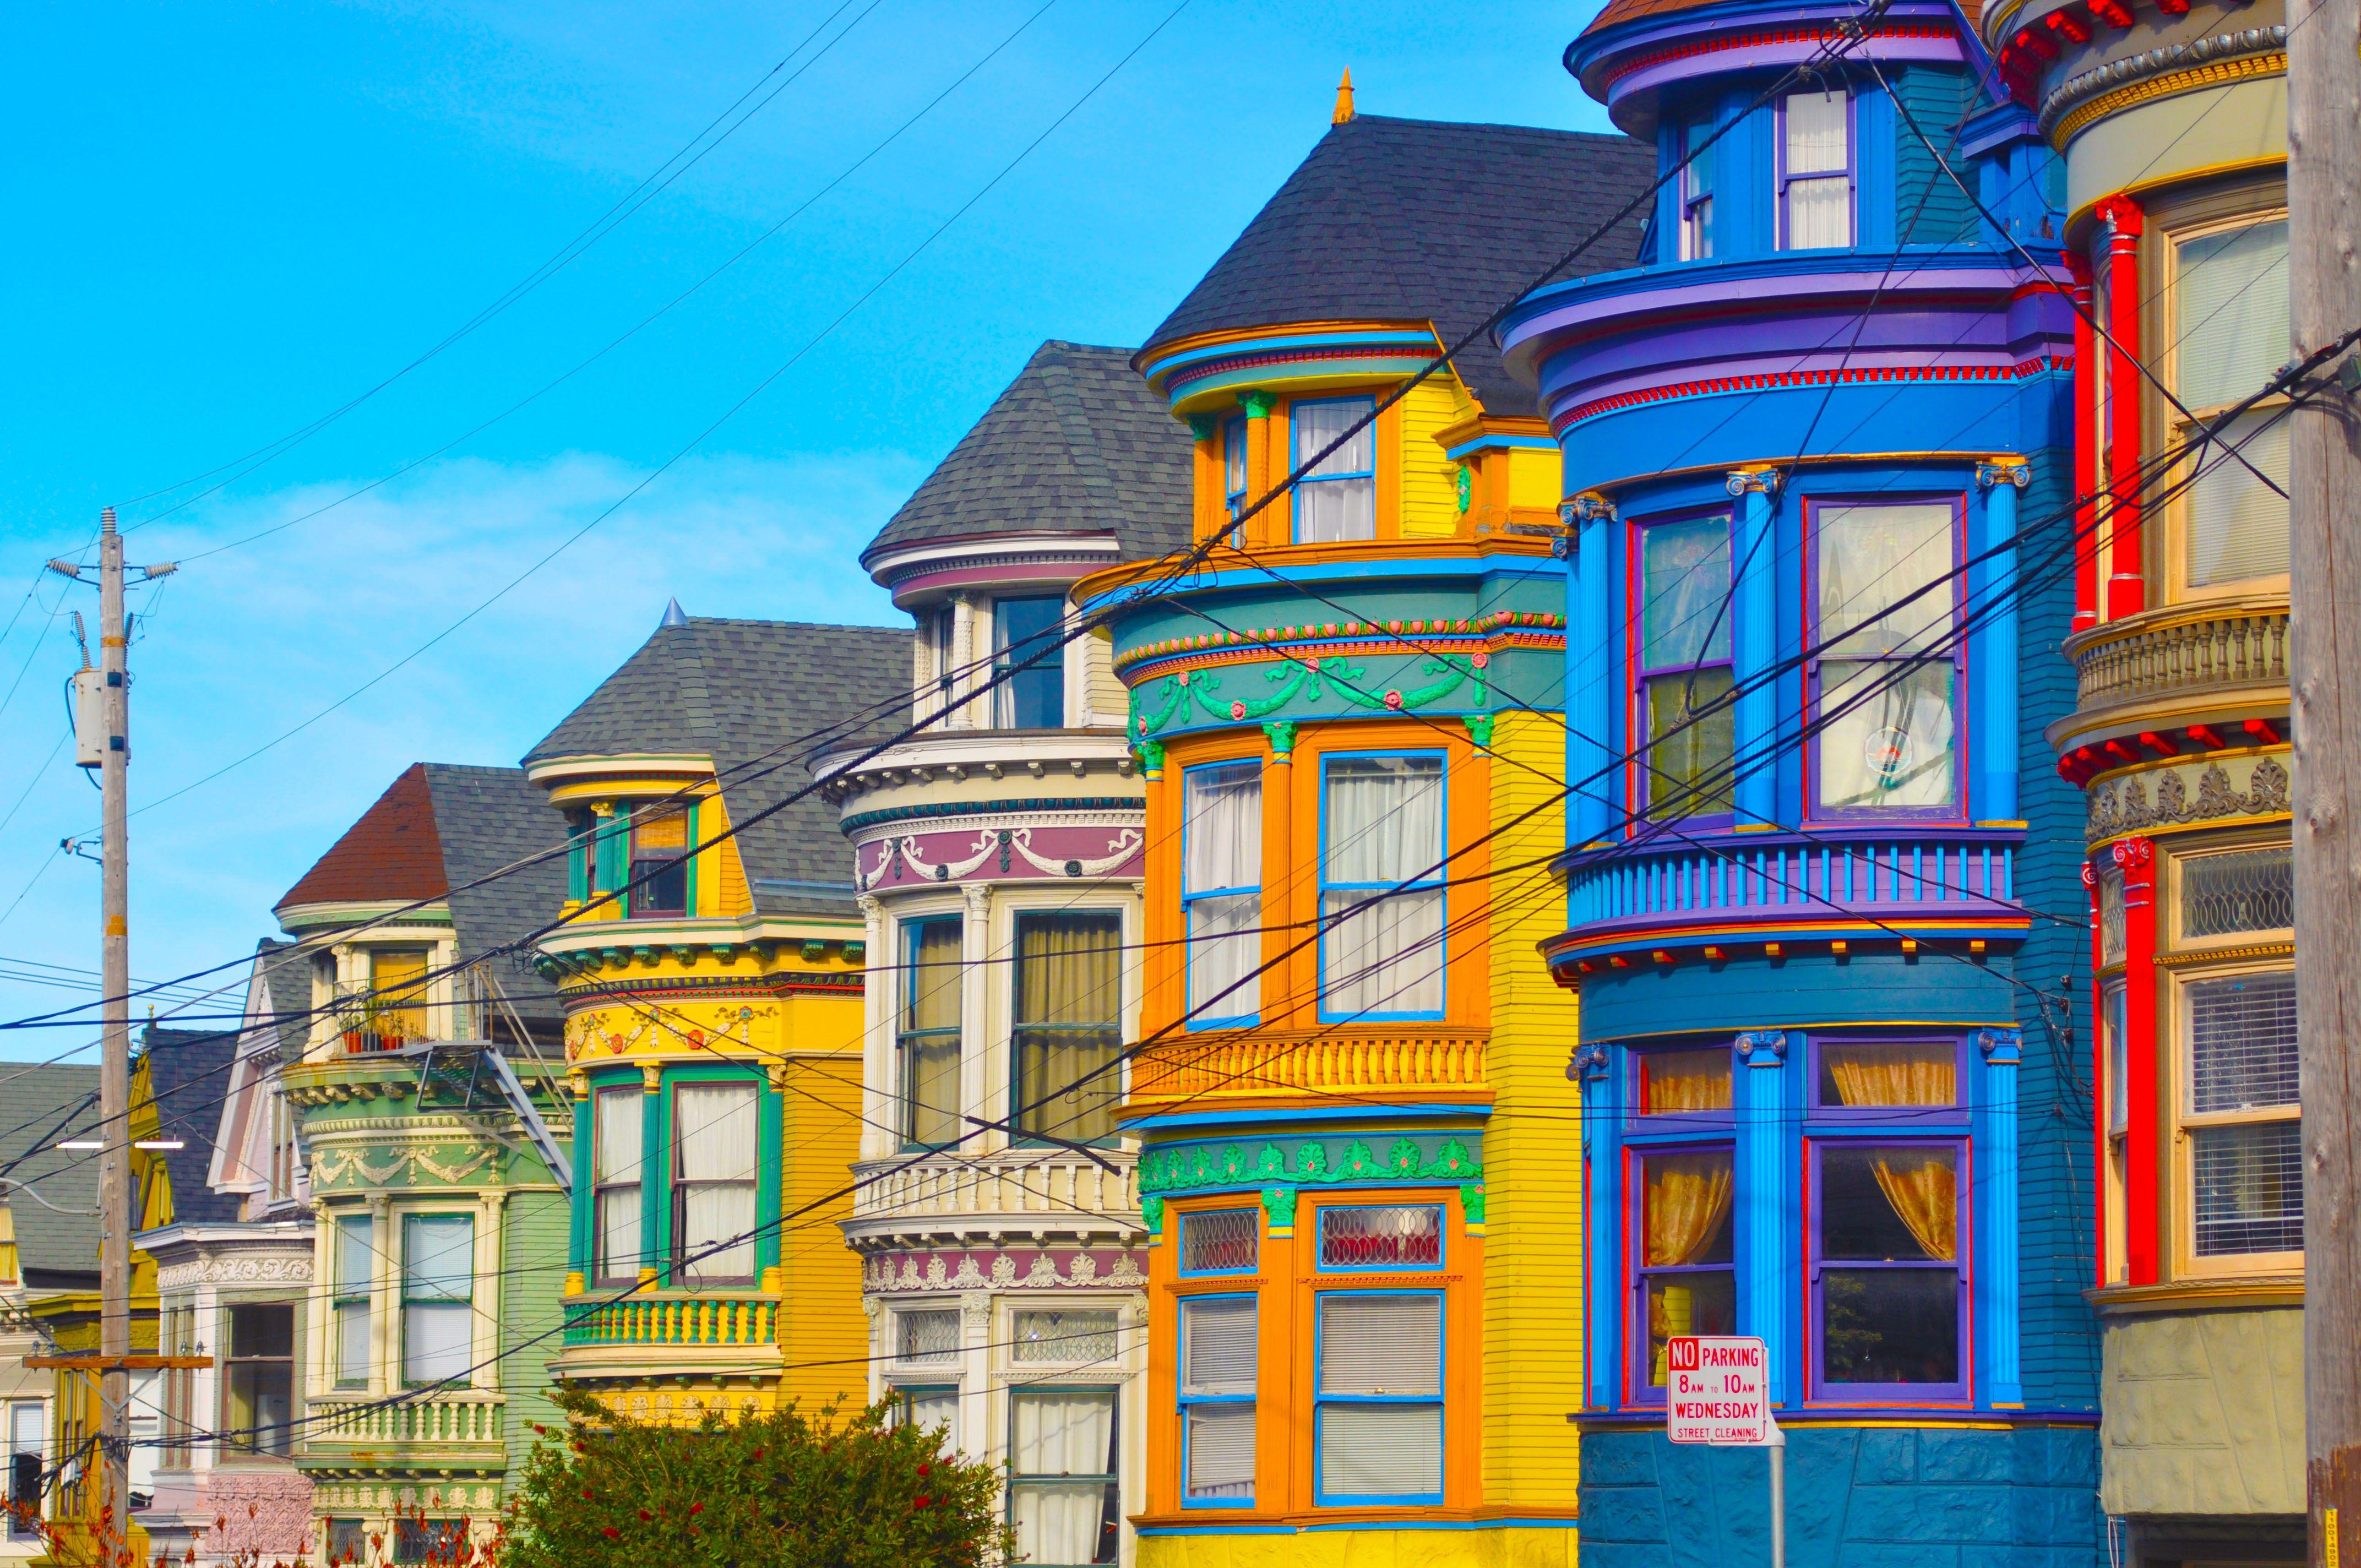 San Fransisco, USA